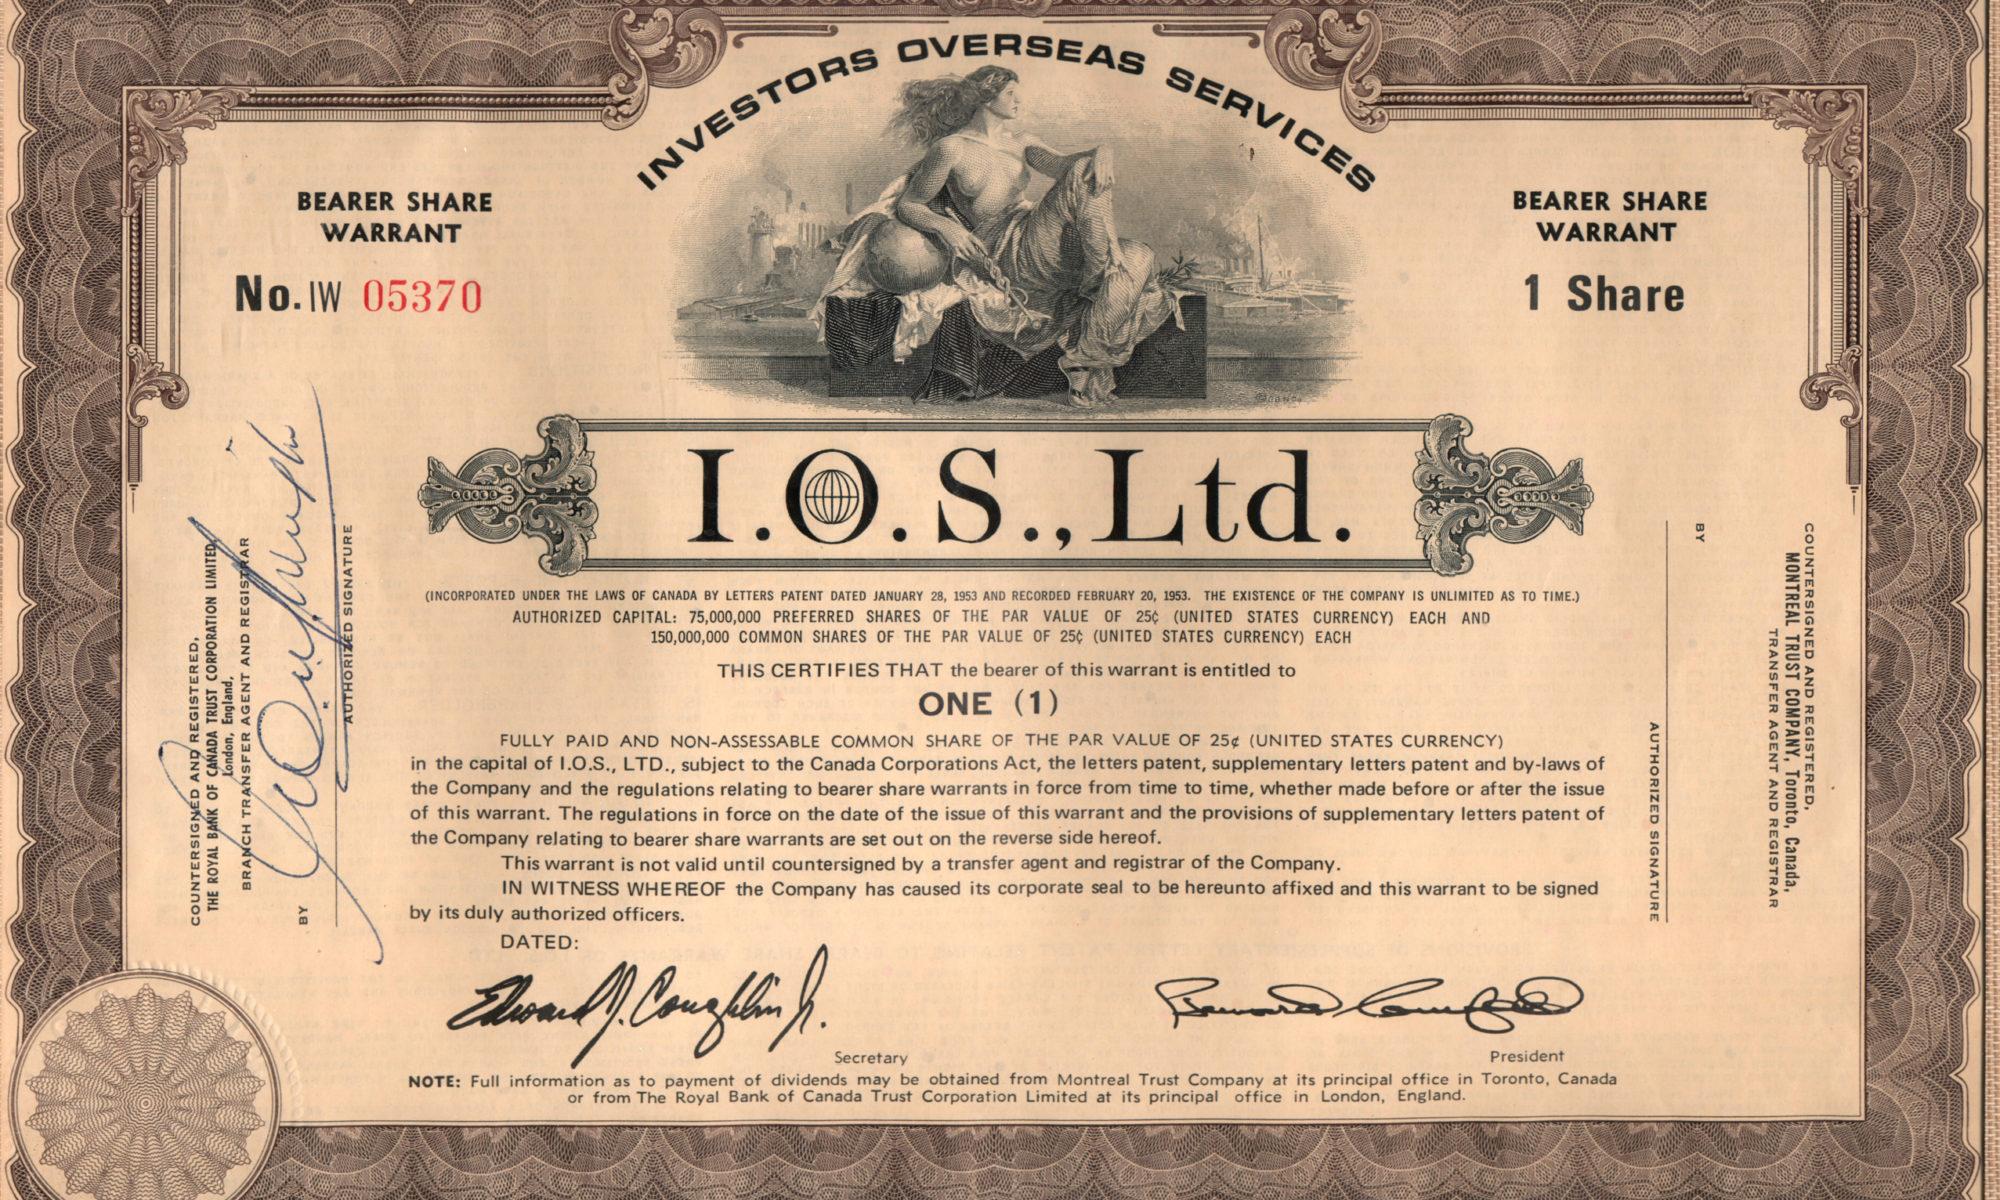 IOS Ltd